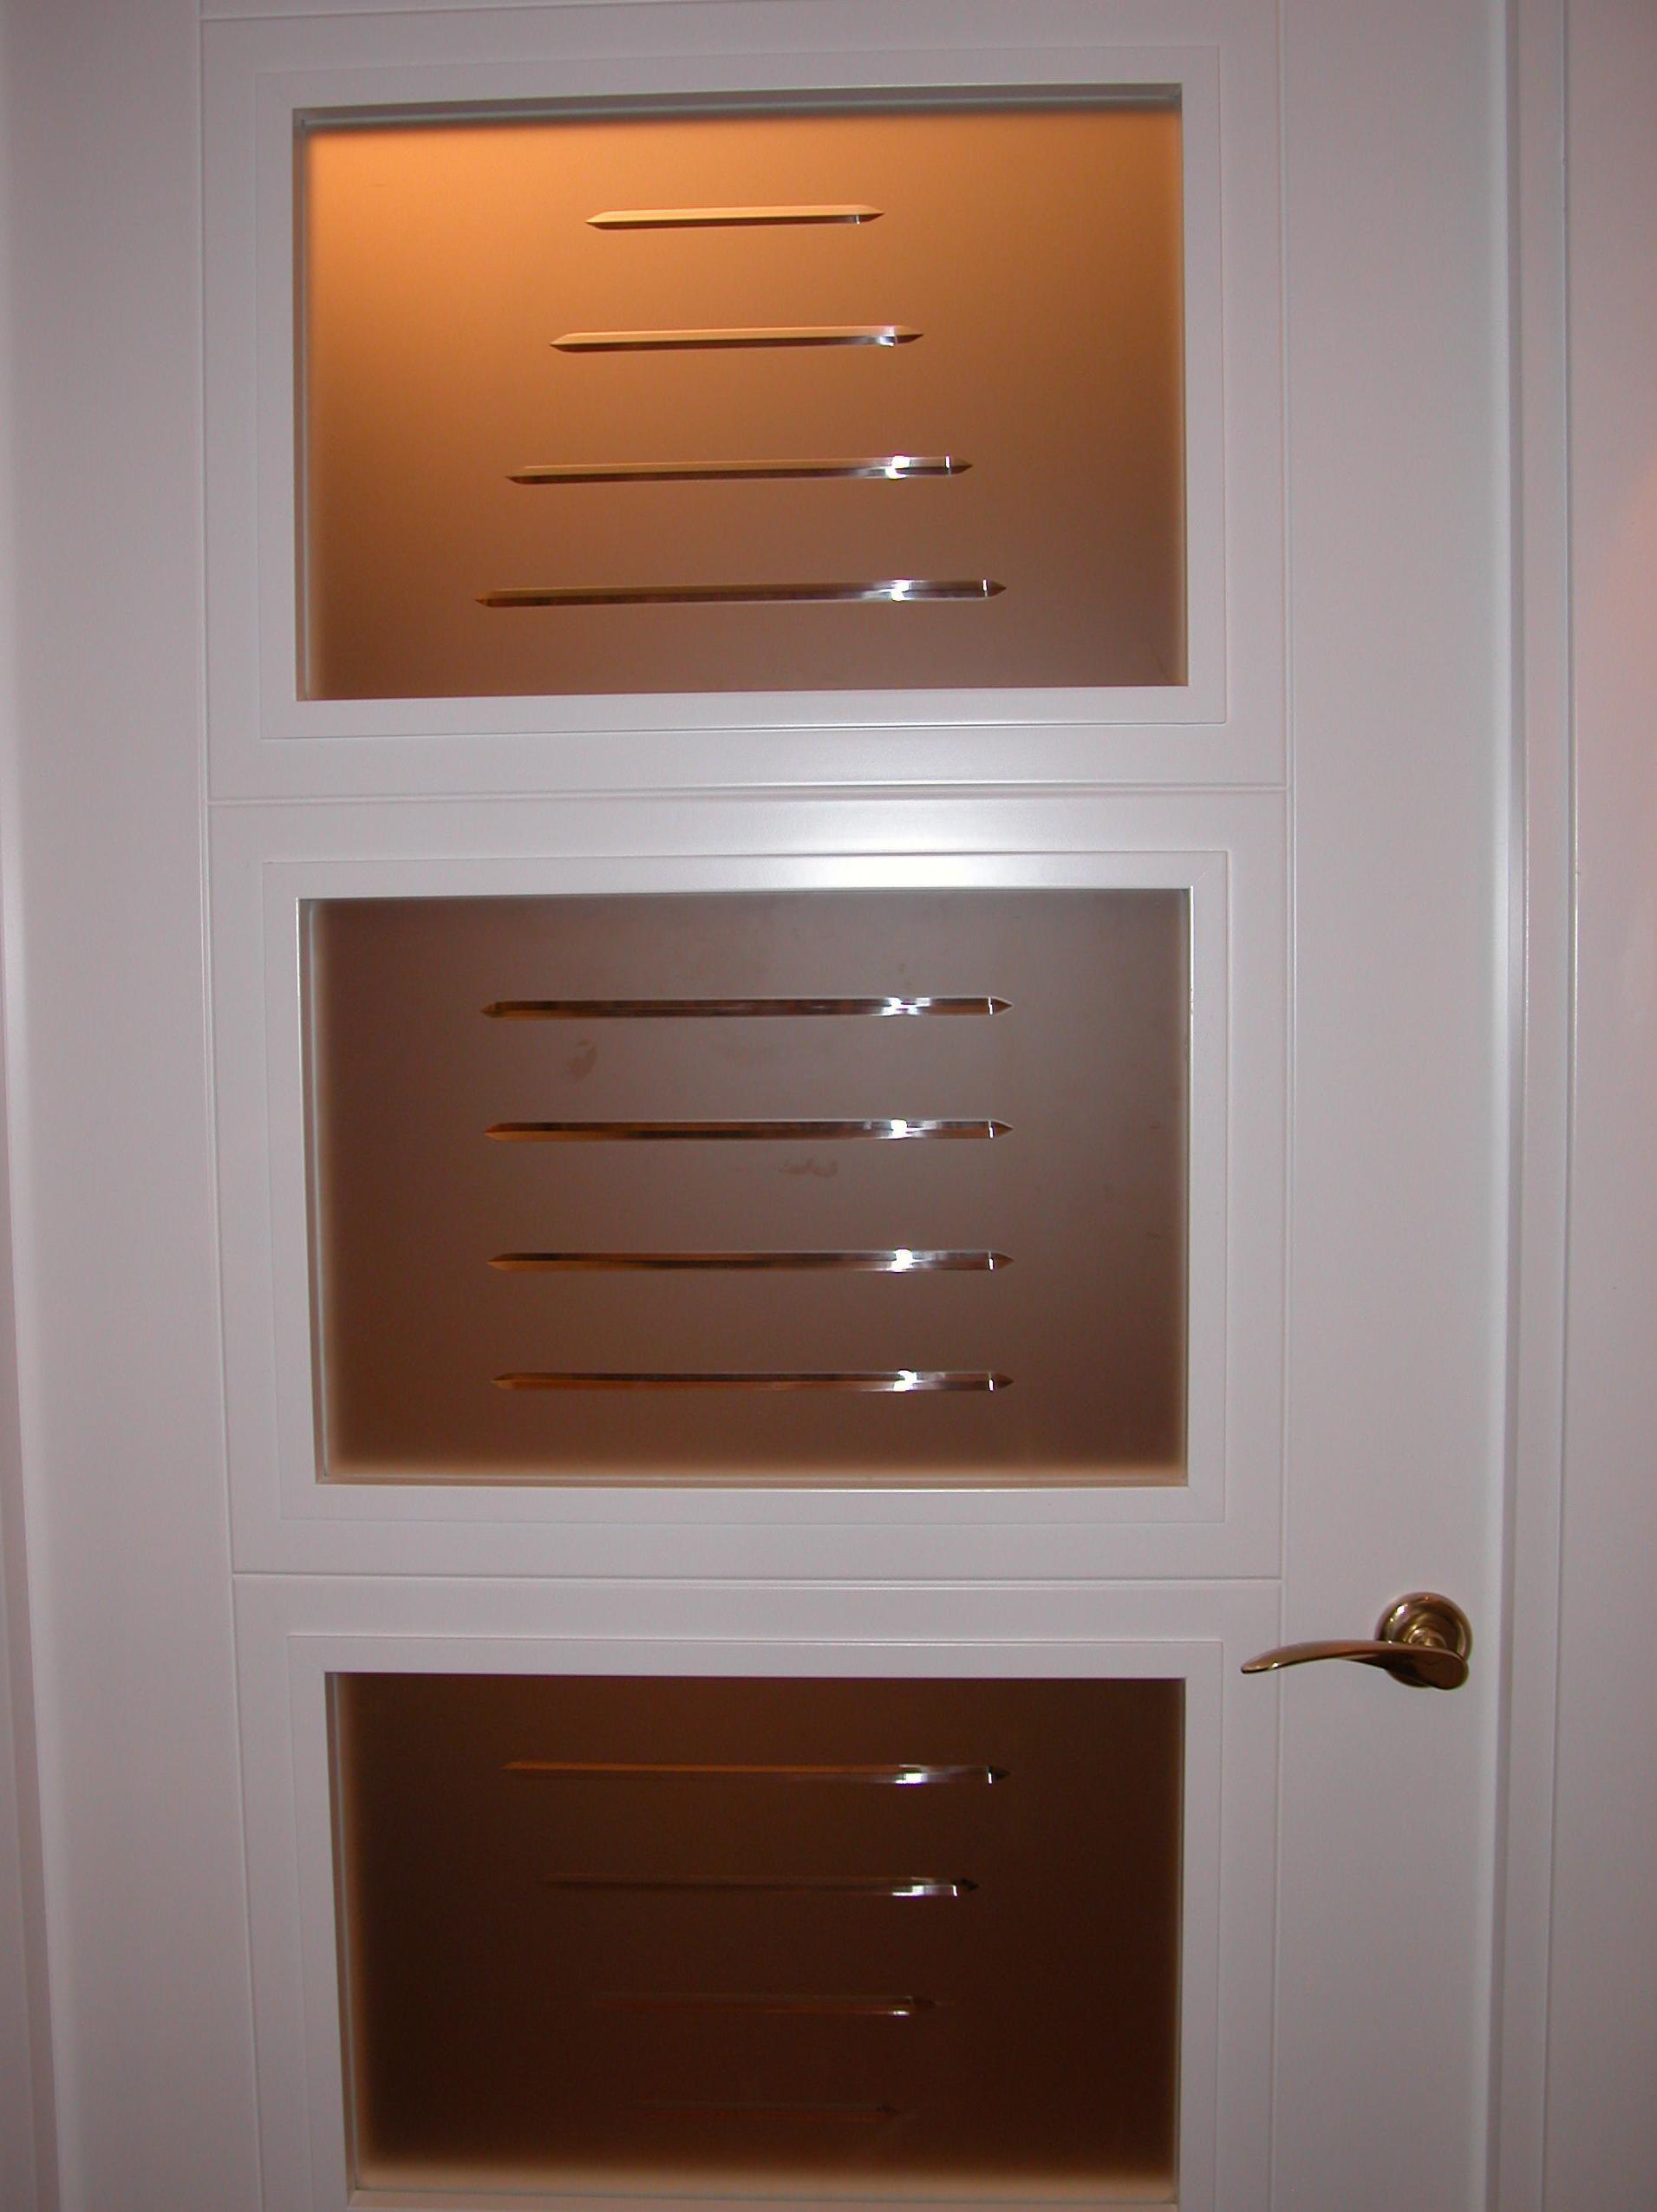 Cristales para puertas madrid cristaleria madrile a for Cristales translucidos para puertas